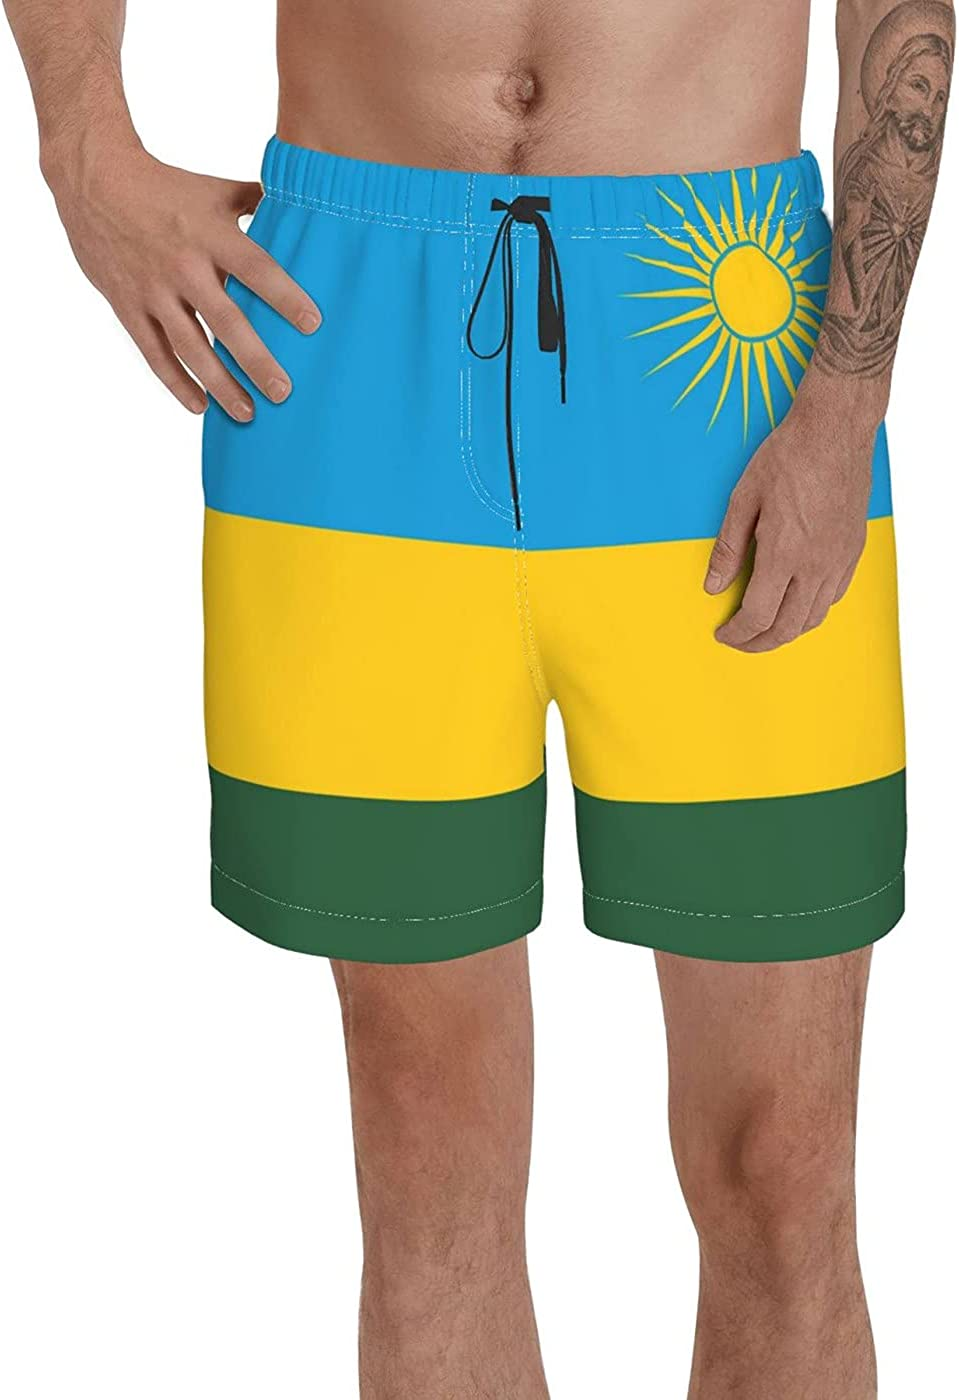 Count Rwanda Flag Men's 3D Printed Funny Summer Quick Dry Swim Short Board Shorts with